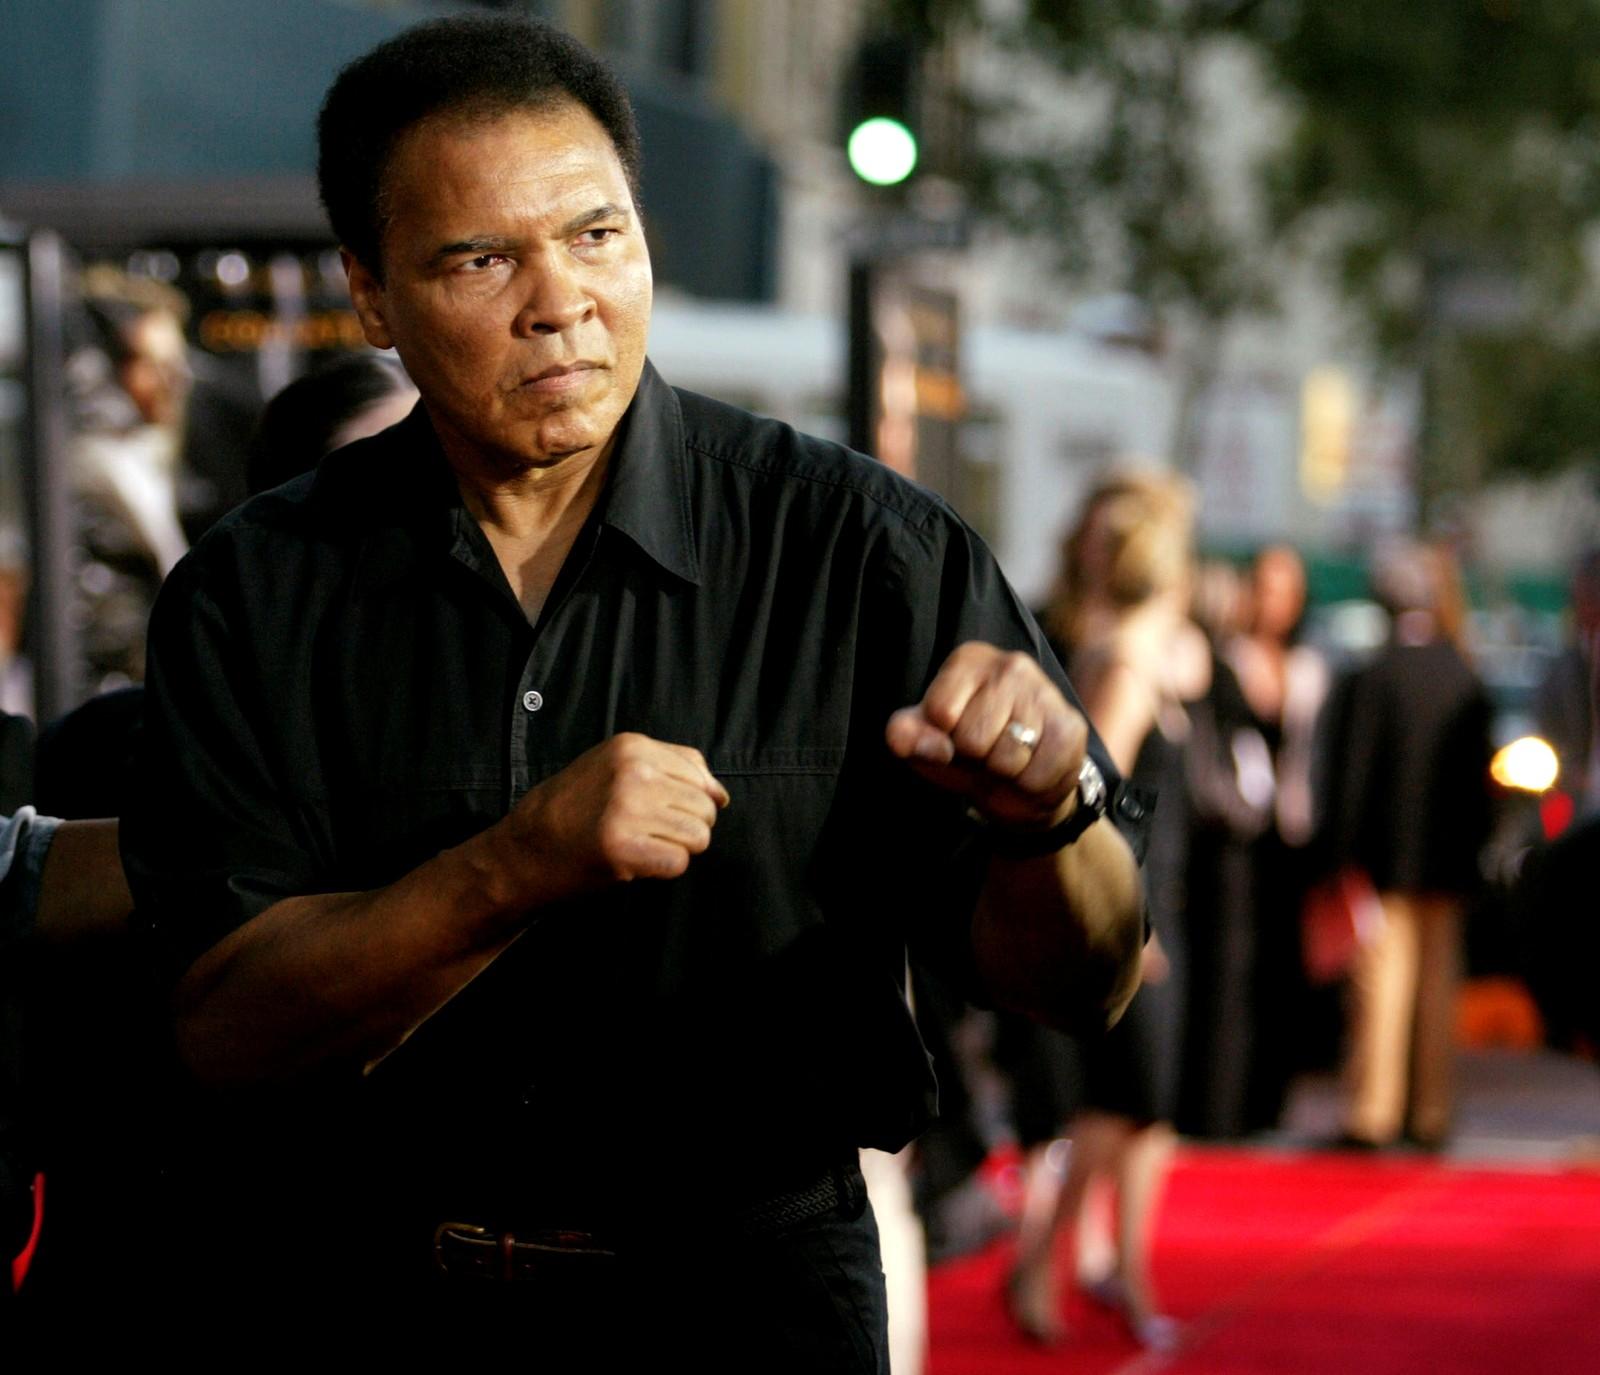 "Boksinelegenden Muhammad Ali bokser mot fotografene under ankomst ved Orpheum Theatre for premiere på filmen ""Collateral"" i Los Angeles i 2. august 2004."